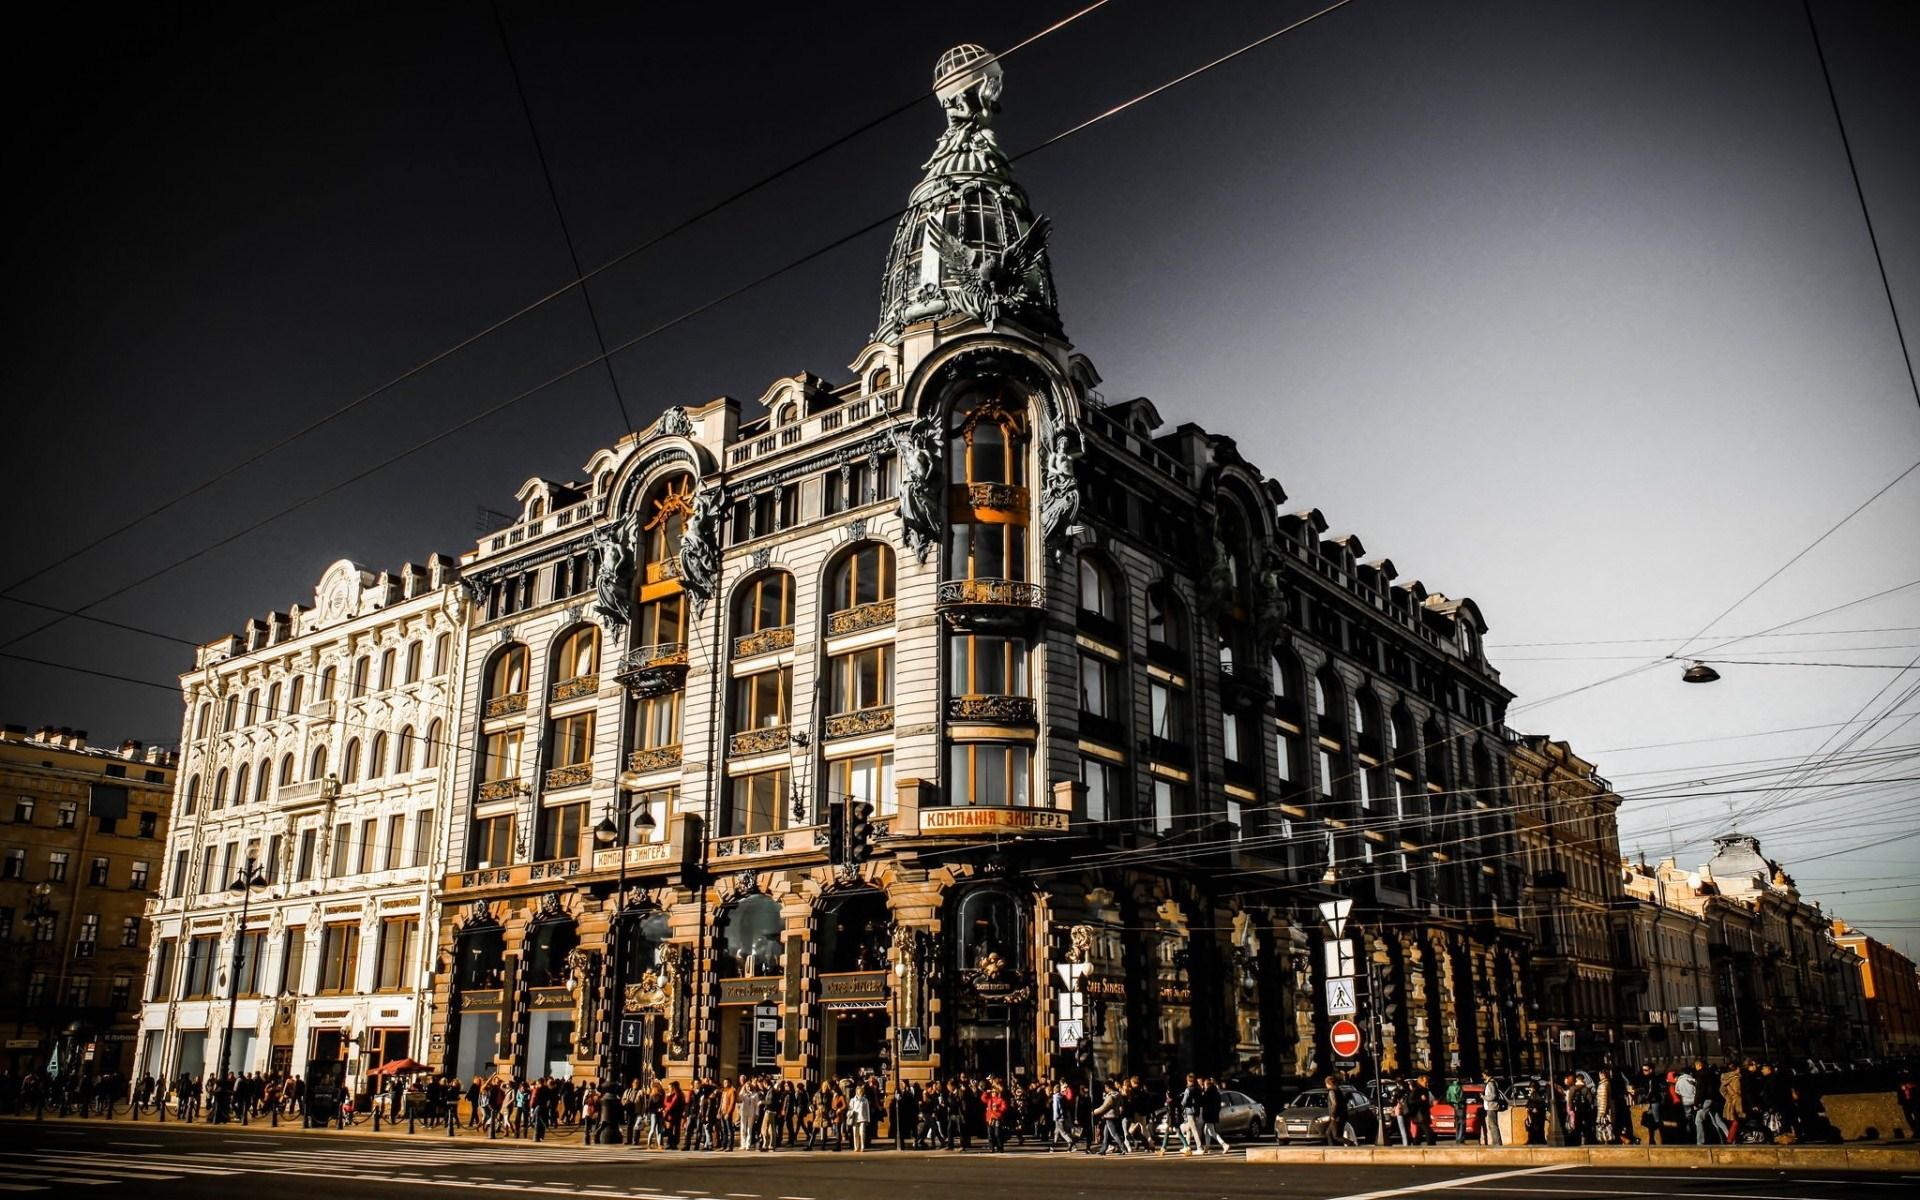 Building People Russia Street 1920x1200